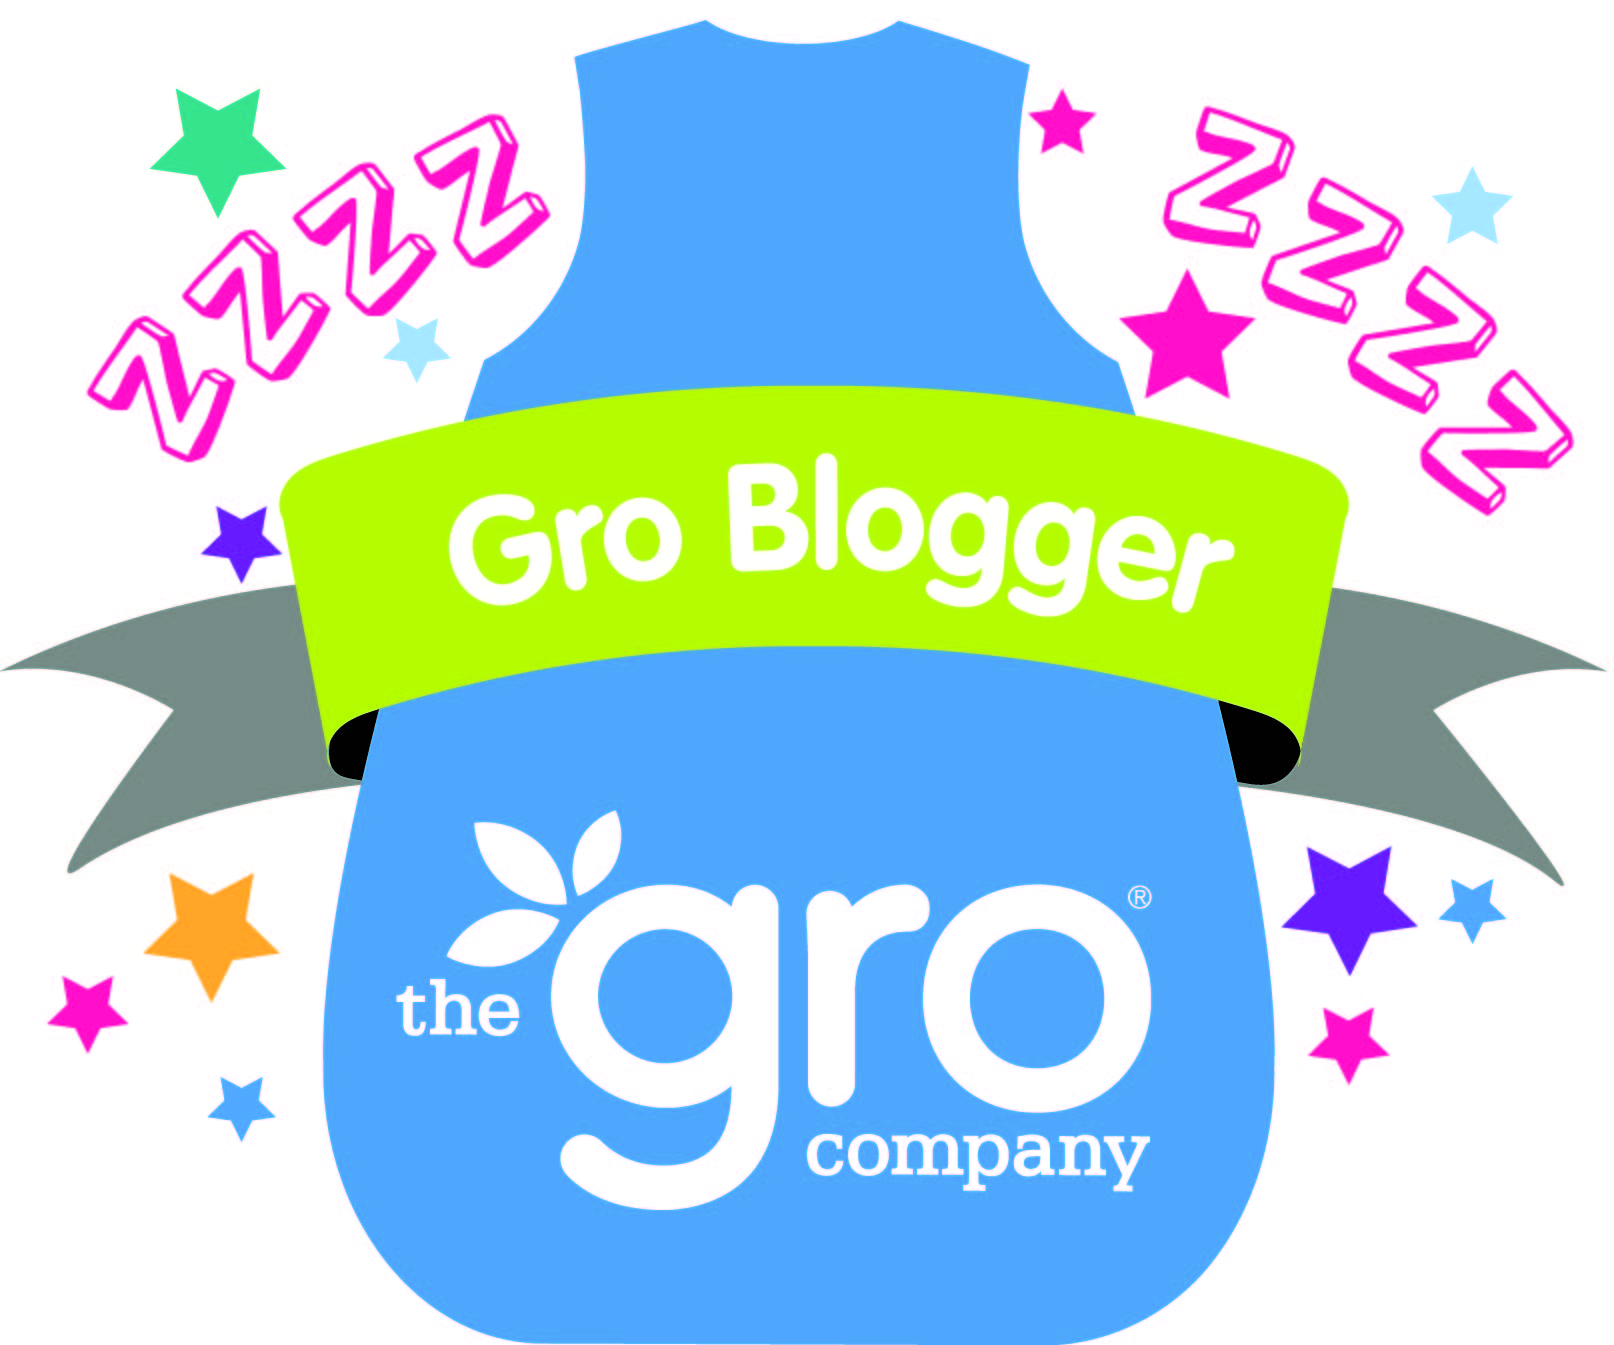 Gro Blogger